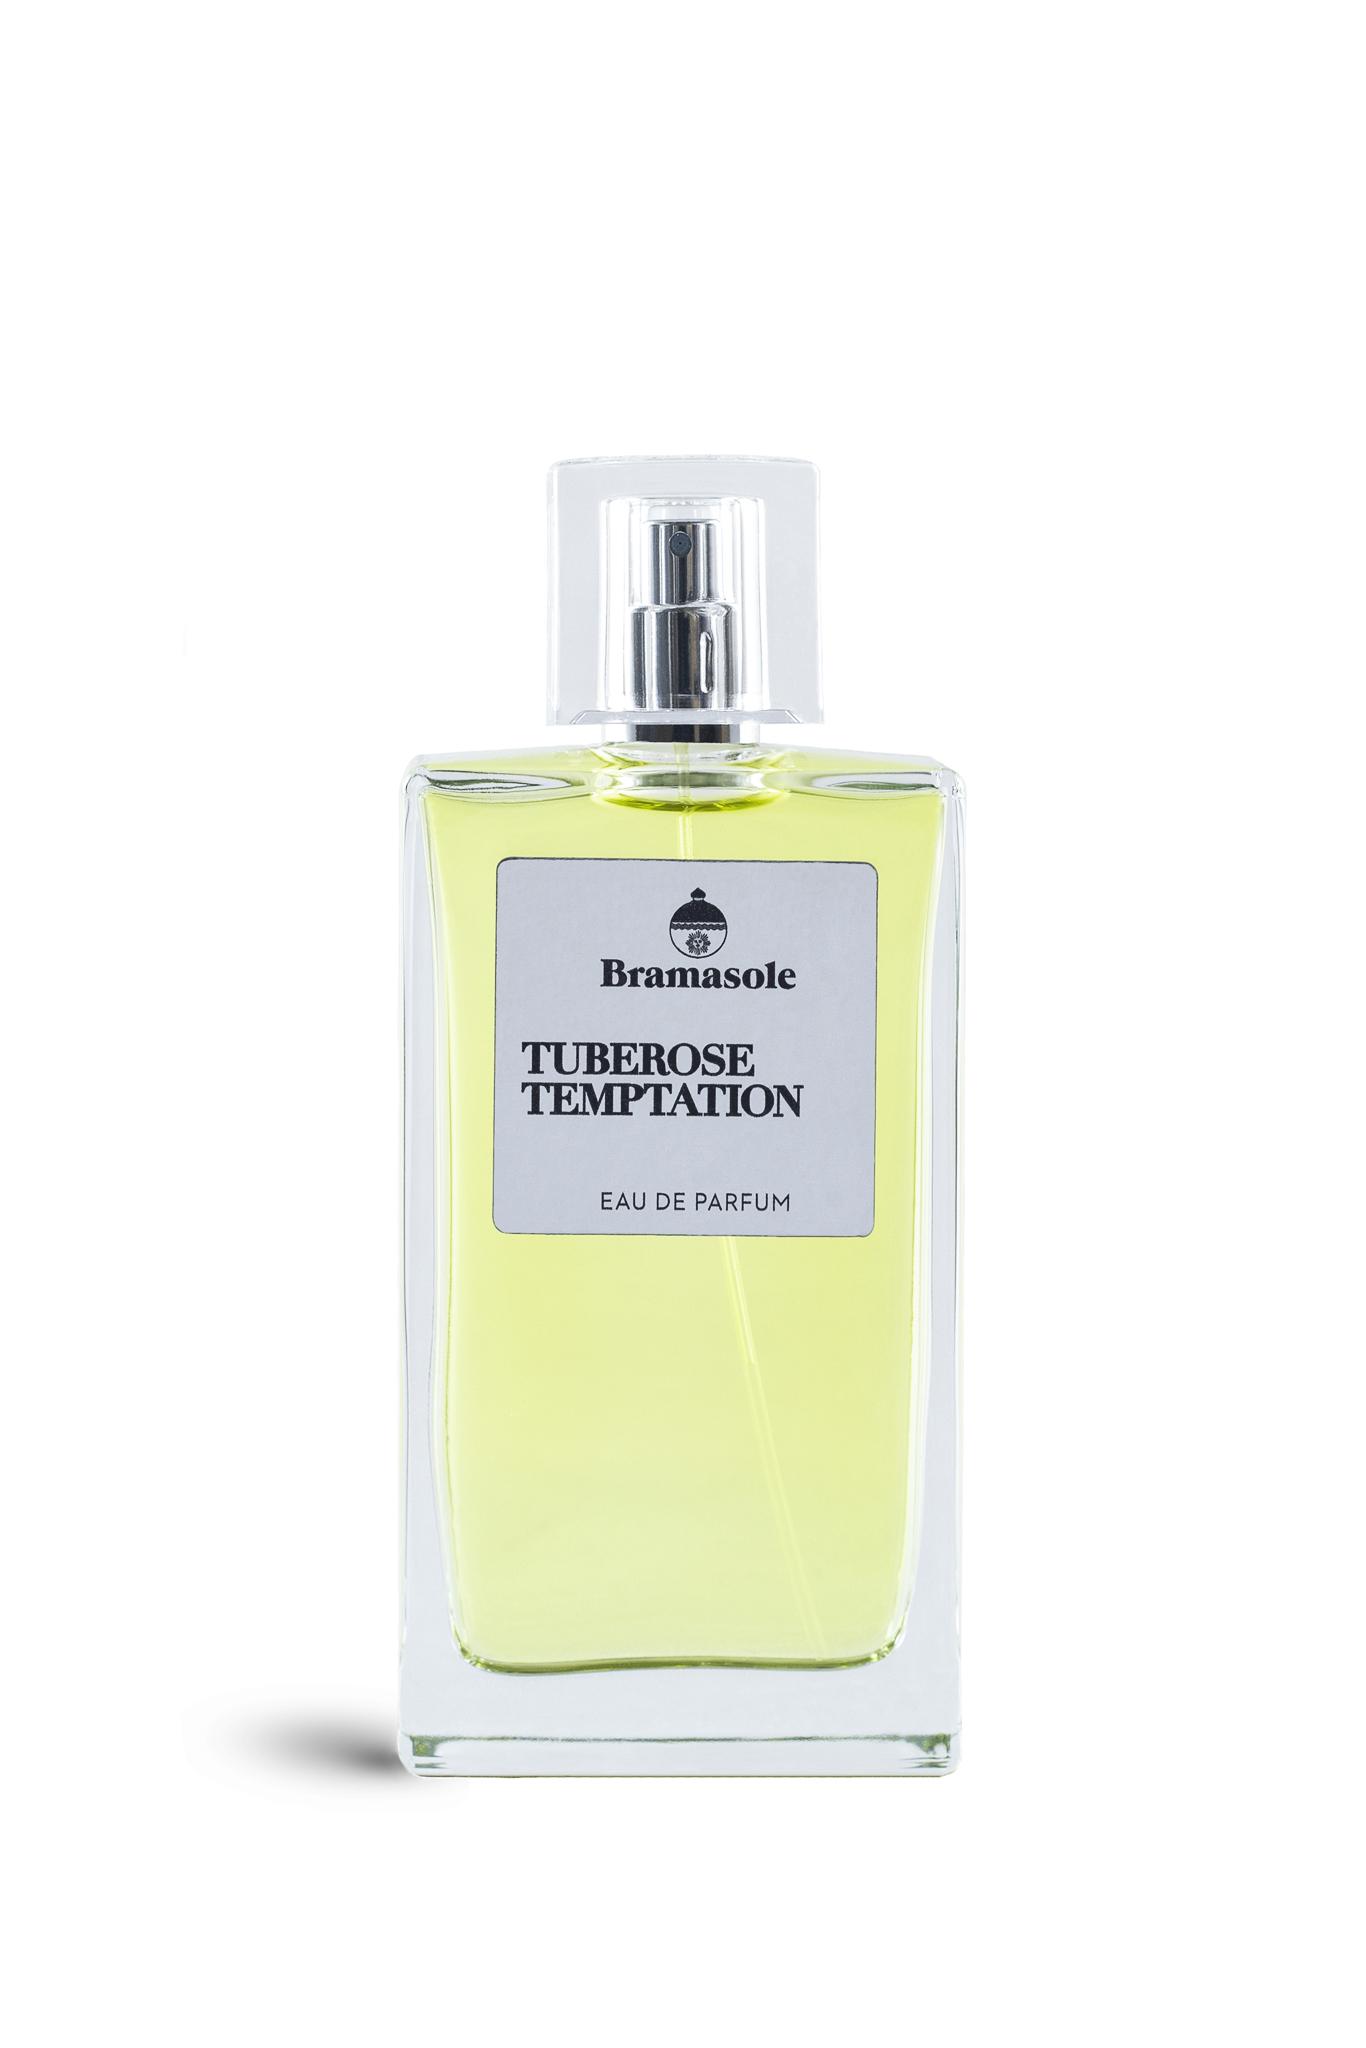 Tuberose Temptation – profumo